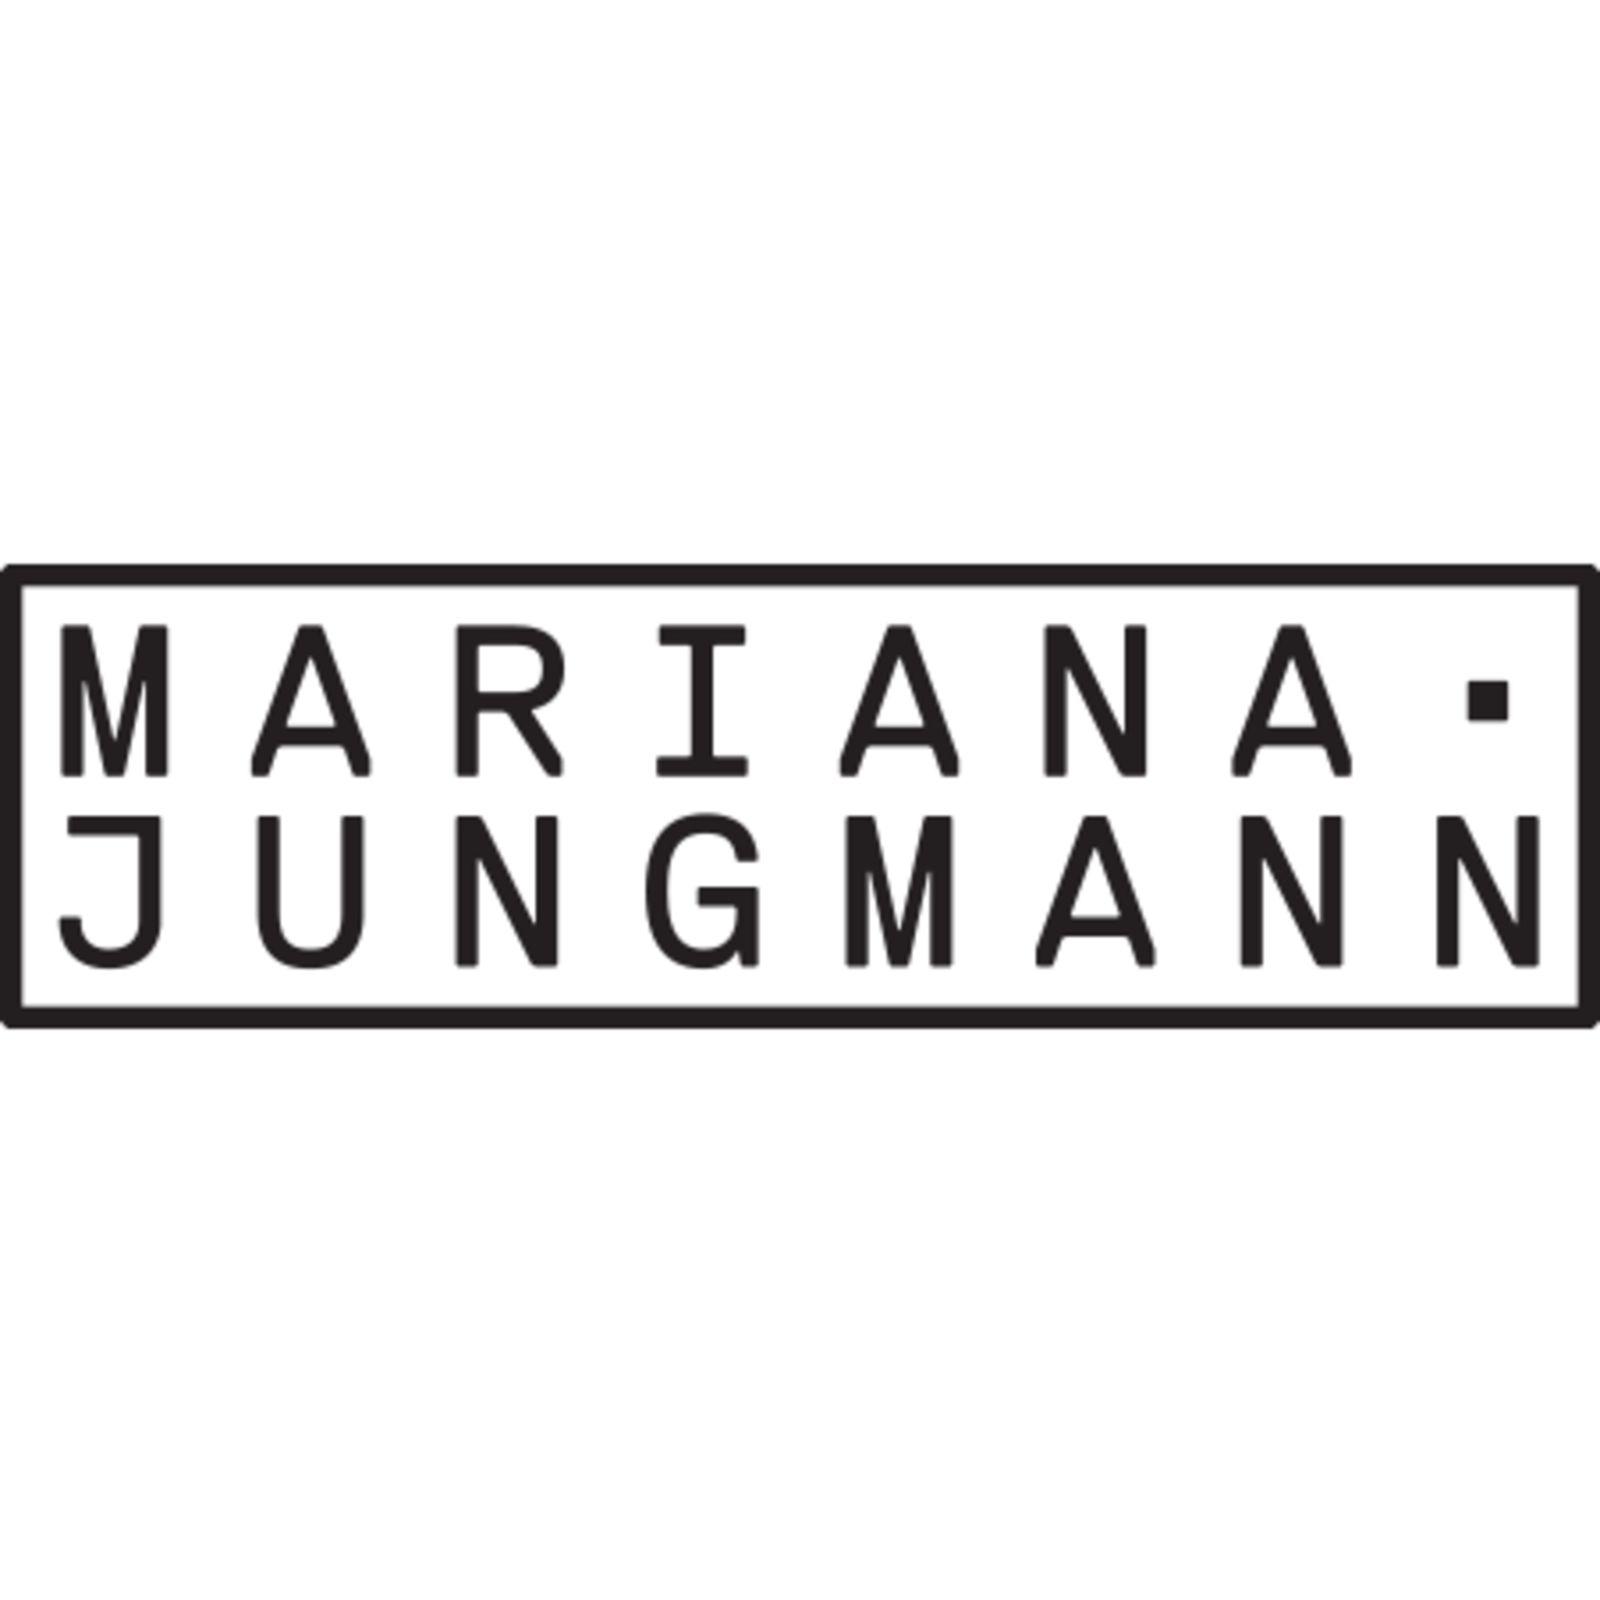 MARIANA JUNGMANN (Image 1)